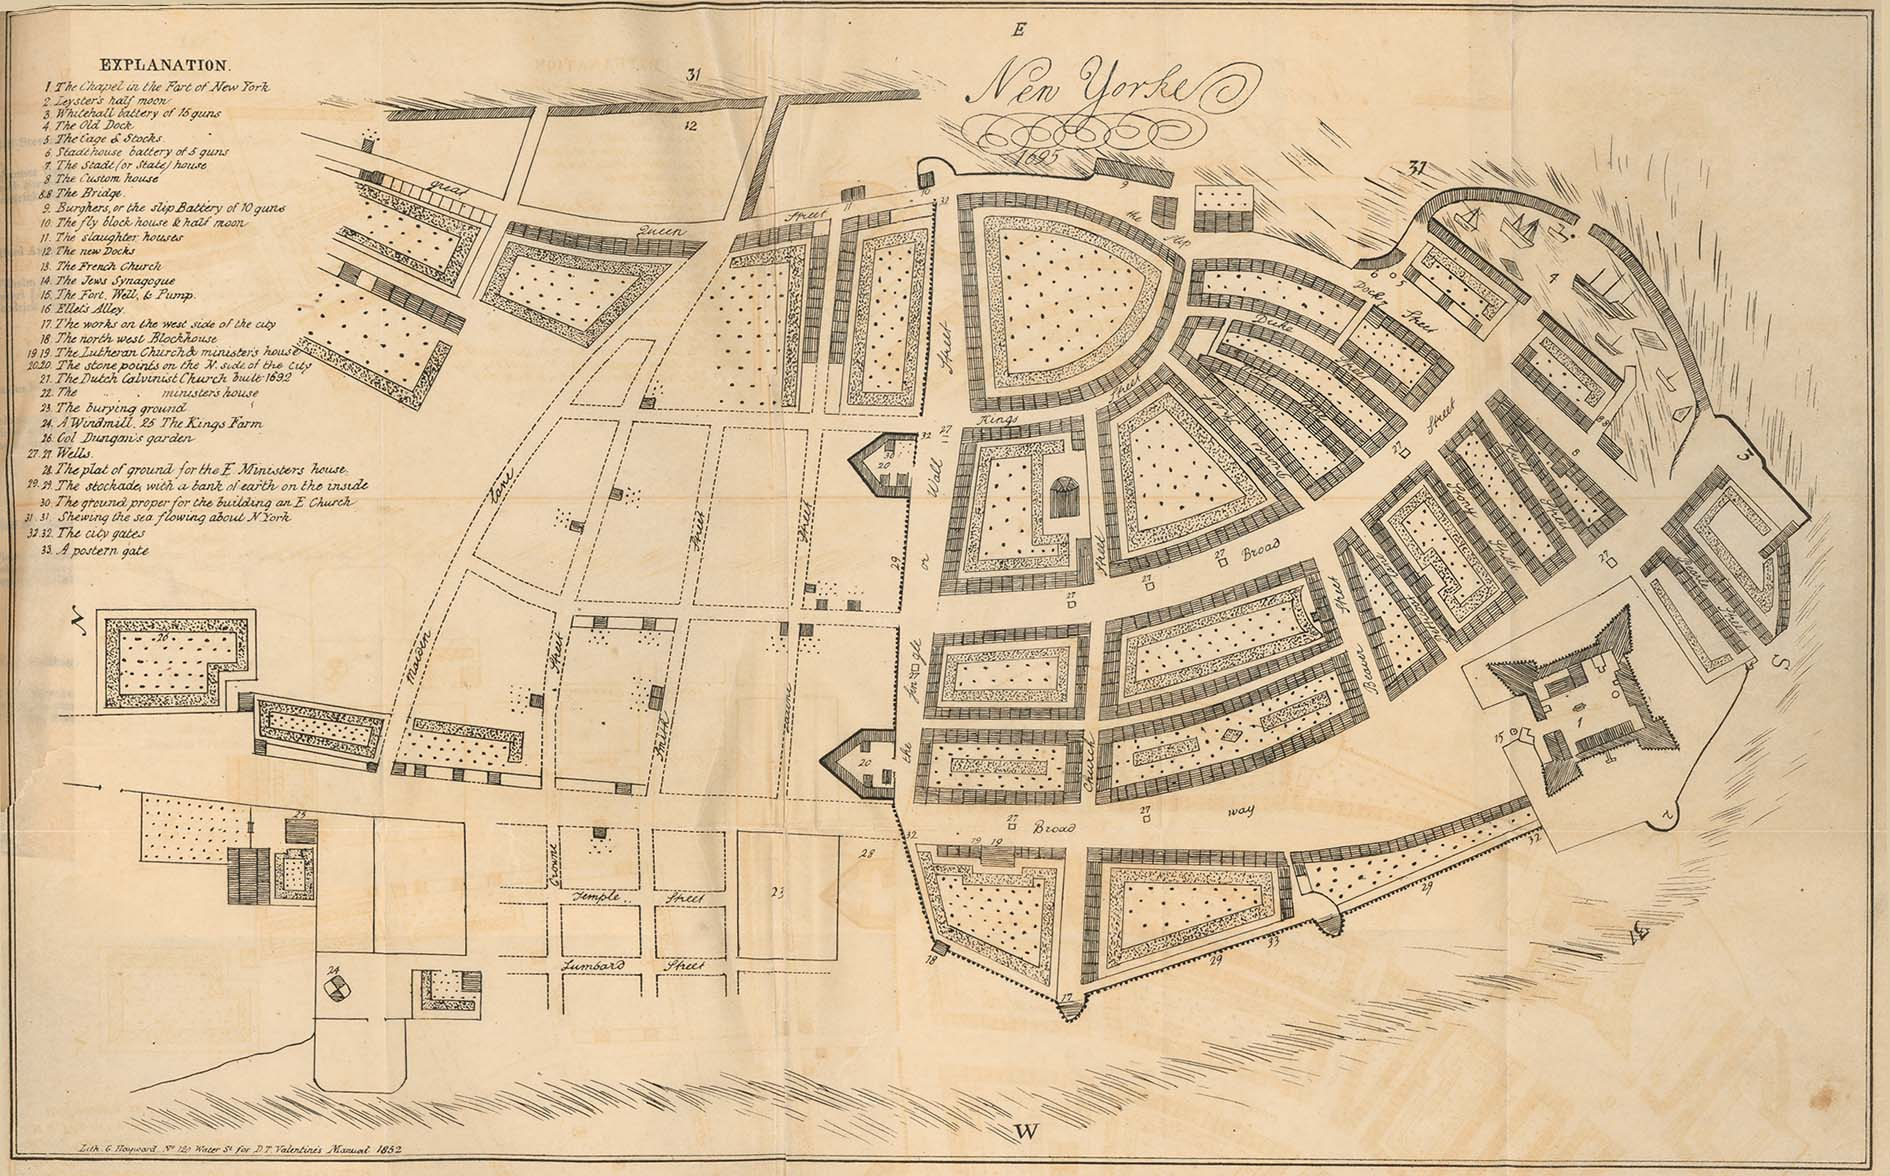 New York City Map, New York, United States 1695